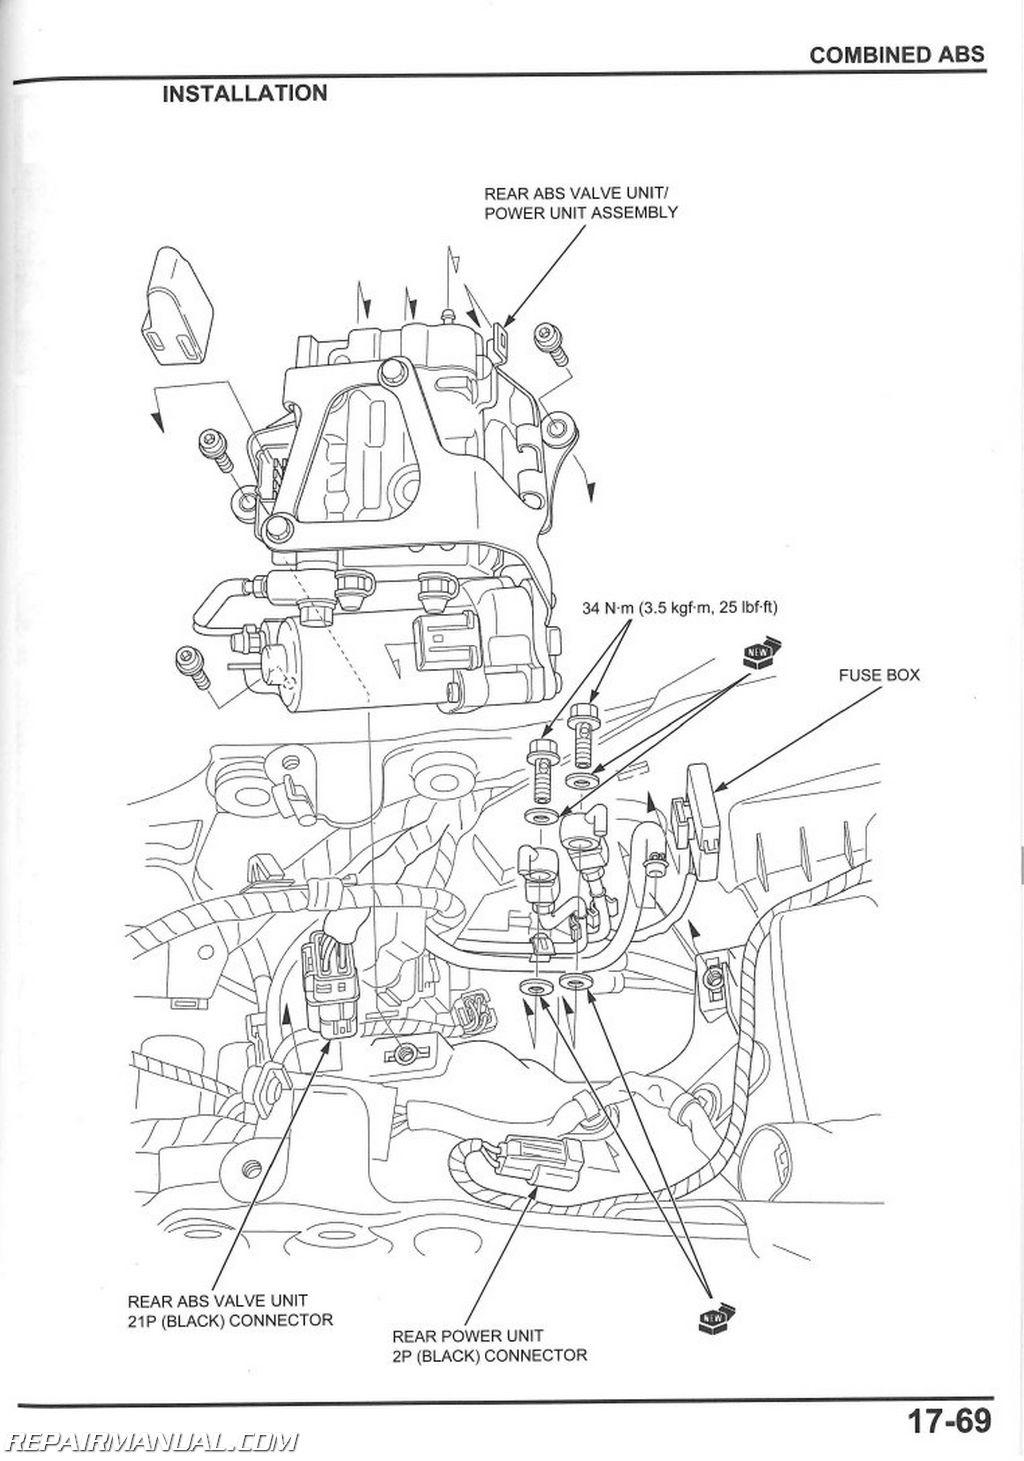 Nissan Quest Parts Catalog 2008 Fuse Box